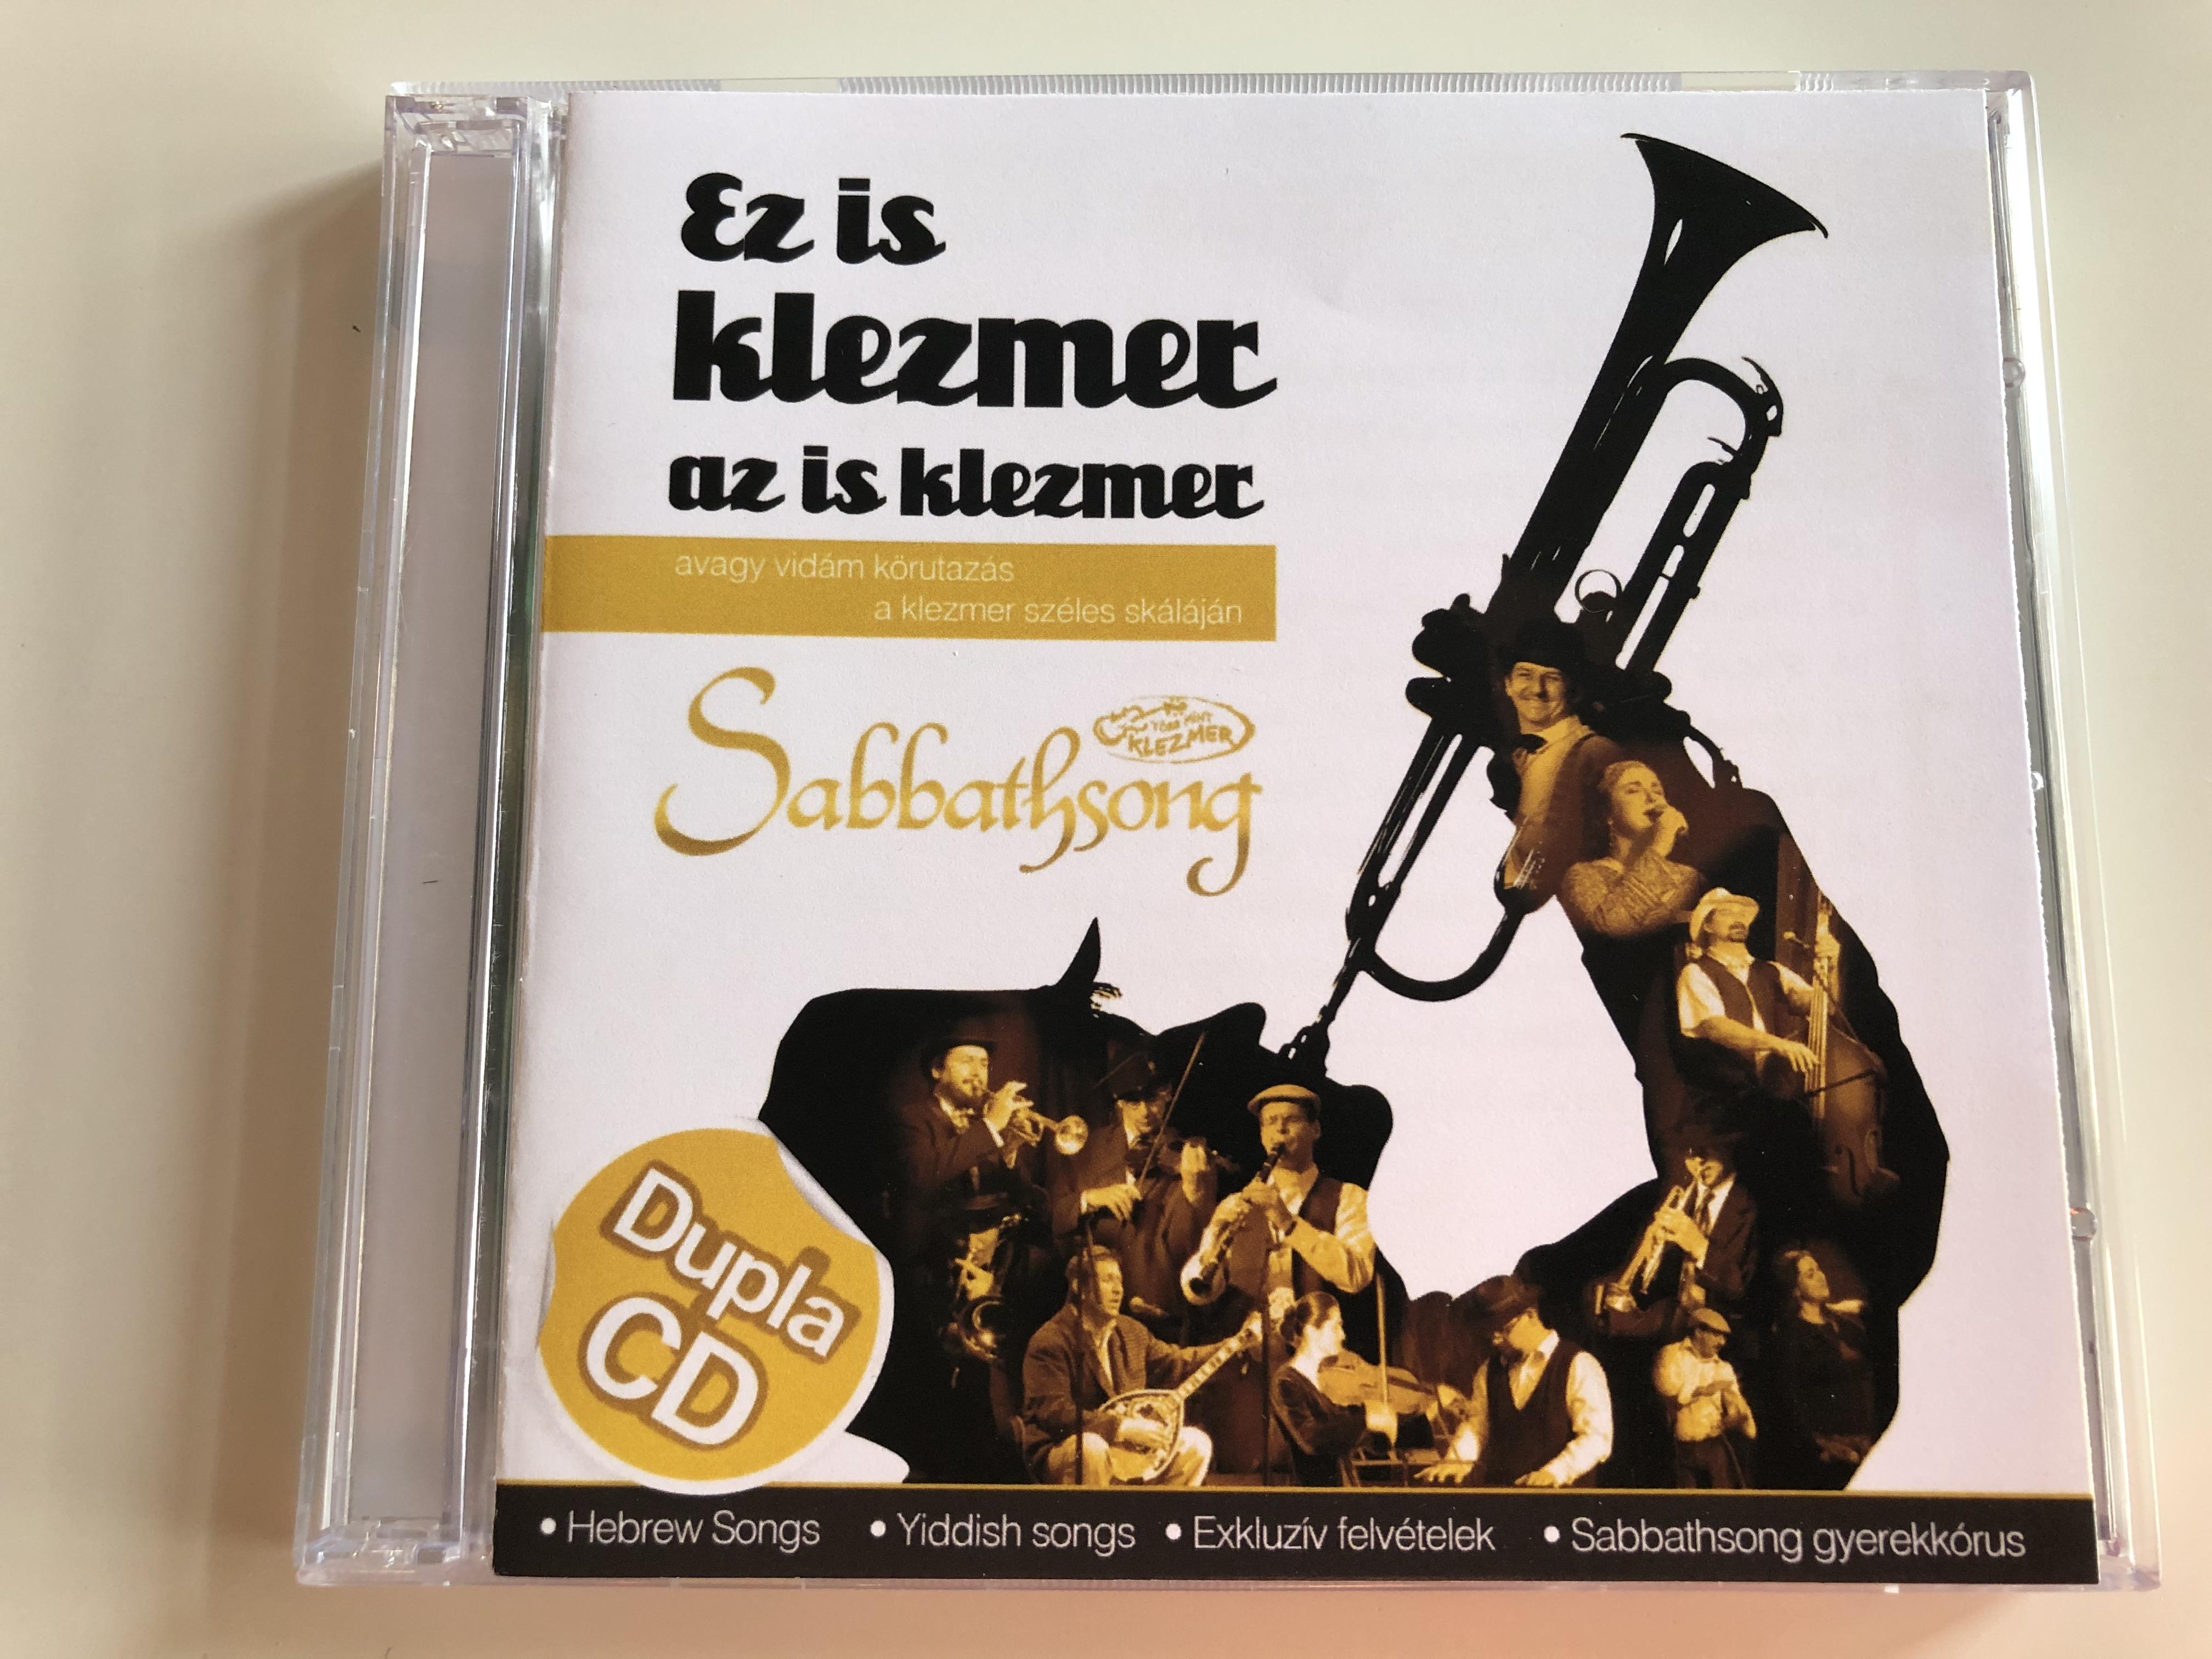 ez-is-klezmer-az-is-klezmer-sabbathsong-hebrew-song-yiddish-songs-1.jpg